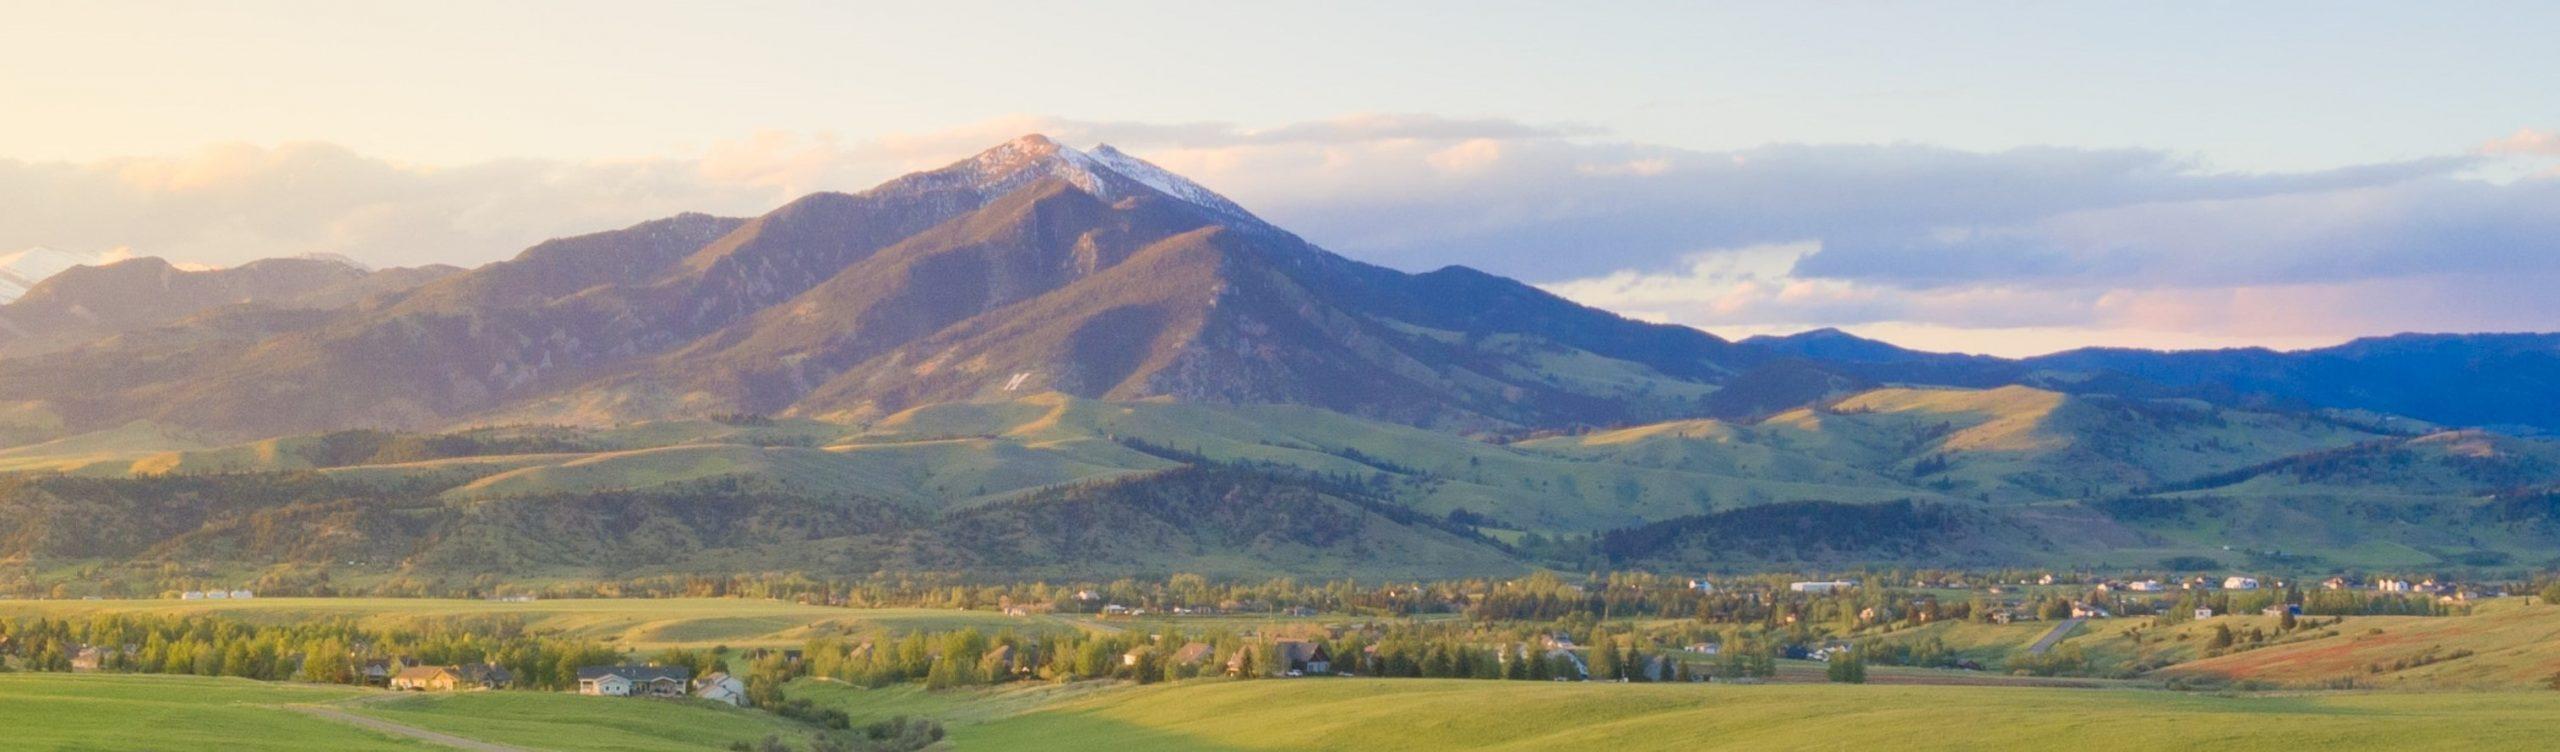 Moving To Bozeman Montana